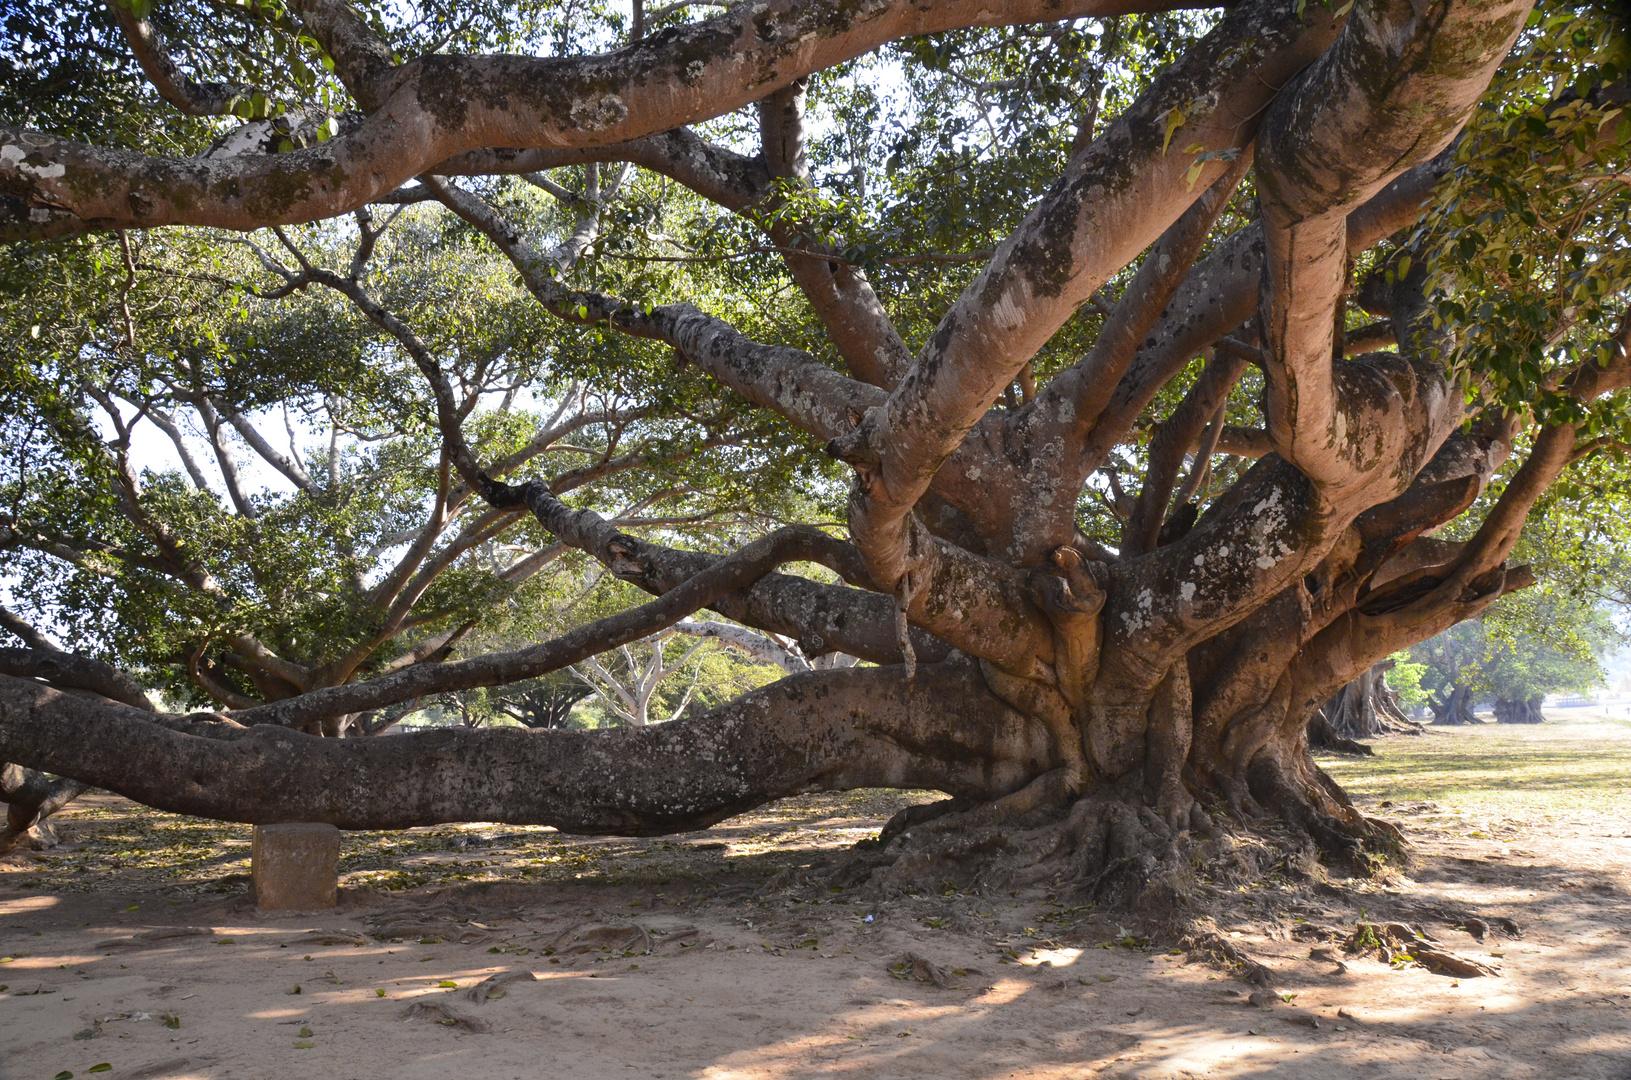 Banyanbaum in Pindaya, Burma